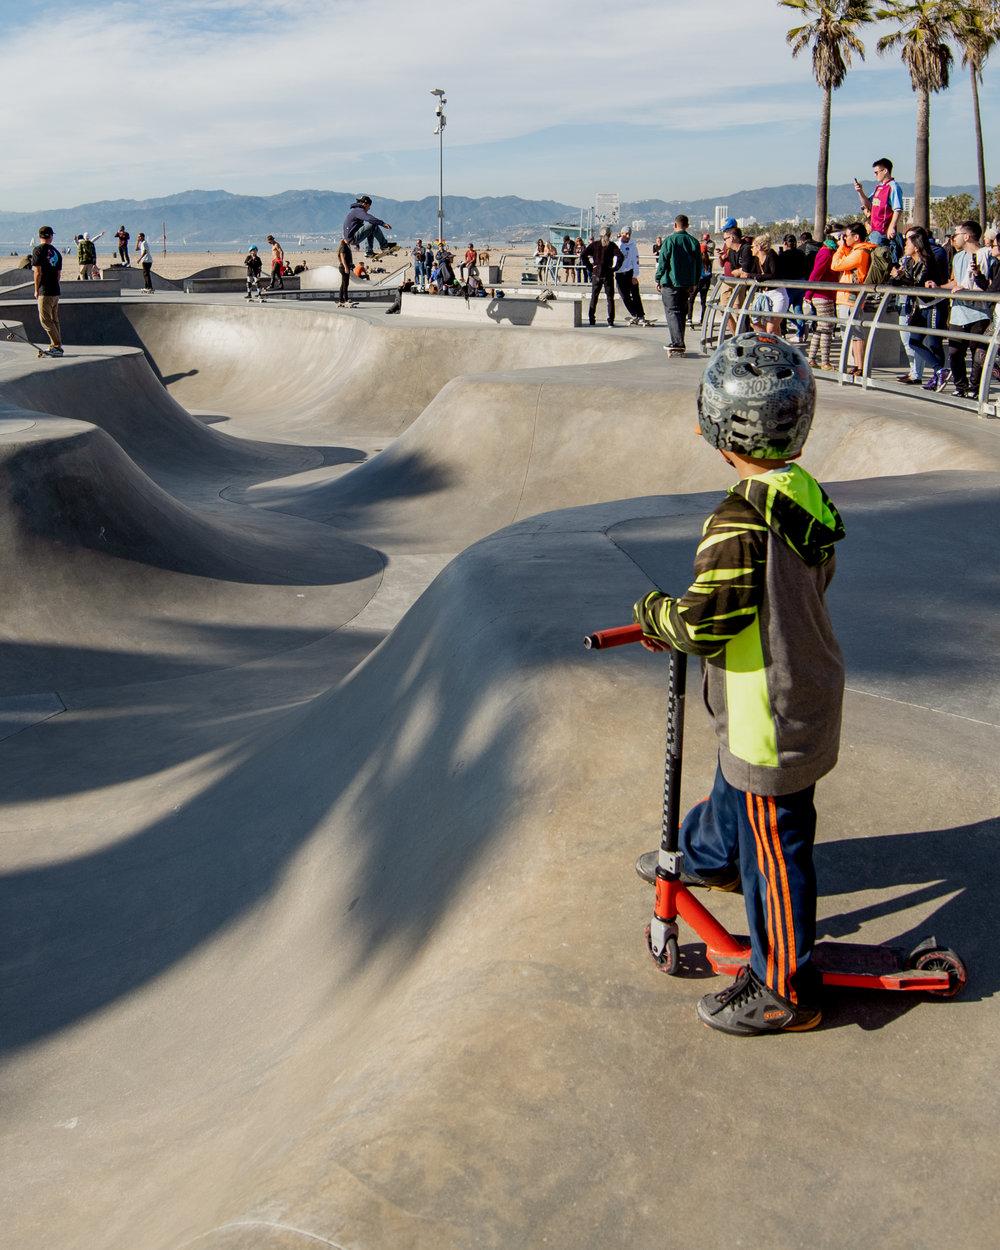 Venice Beach Skateboarders-4.jpg